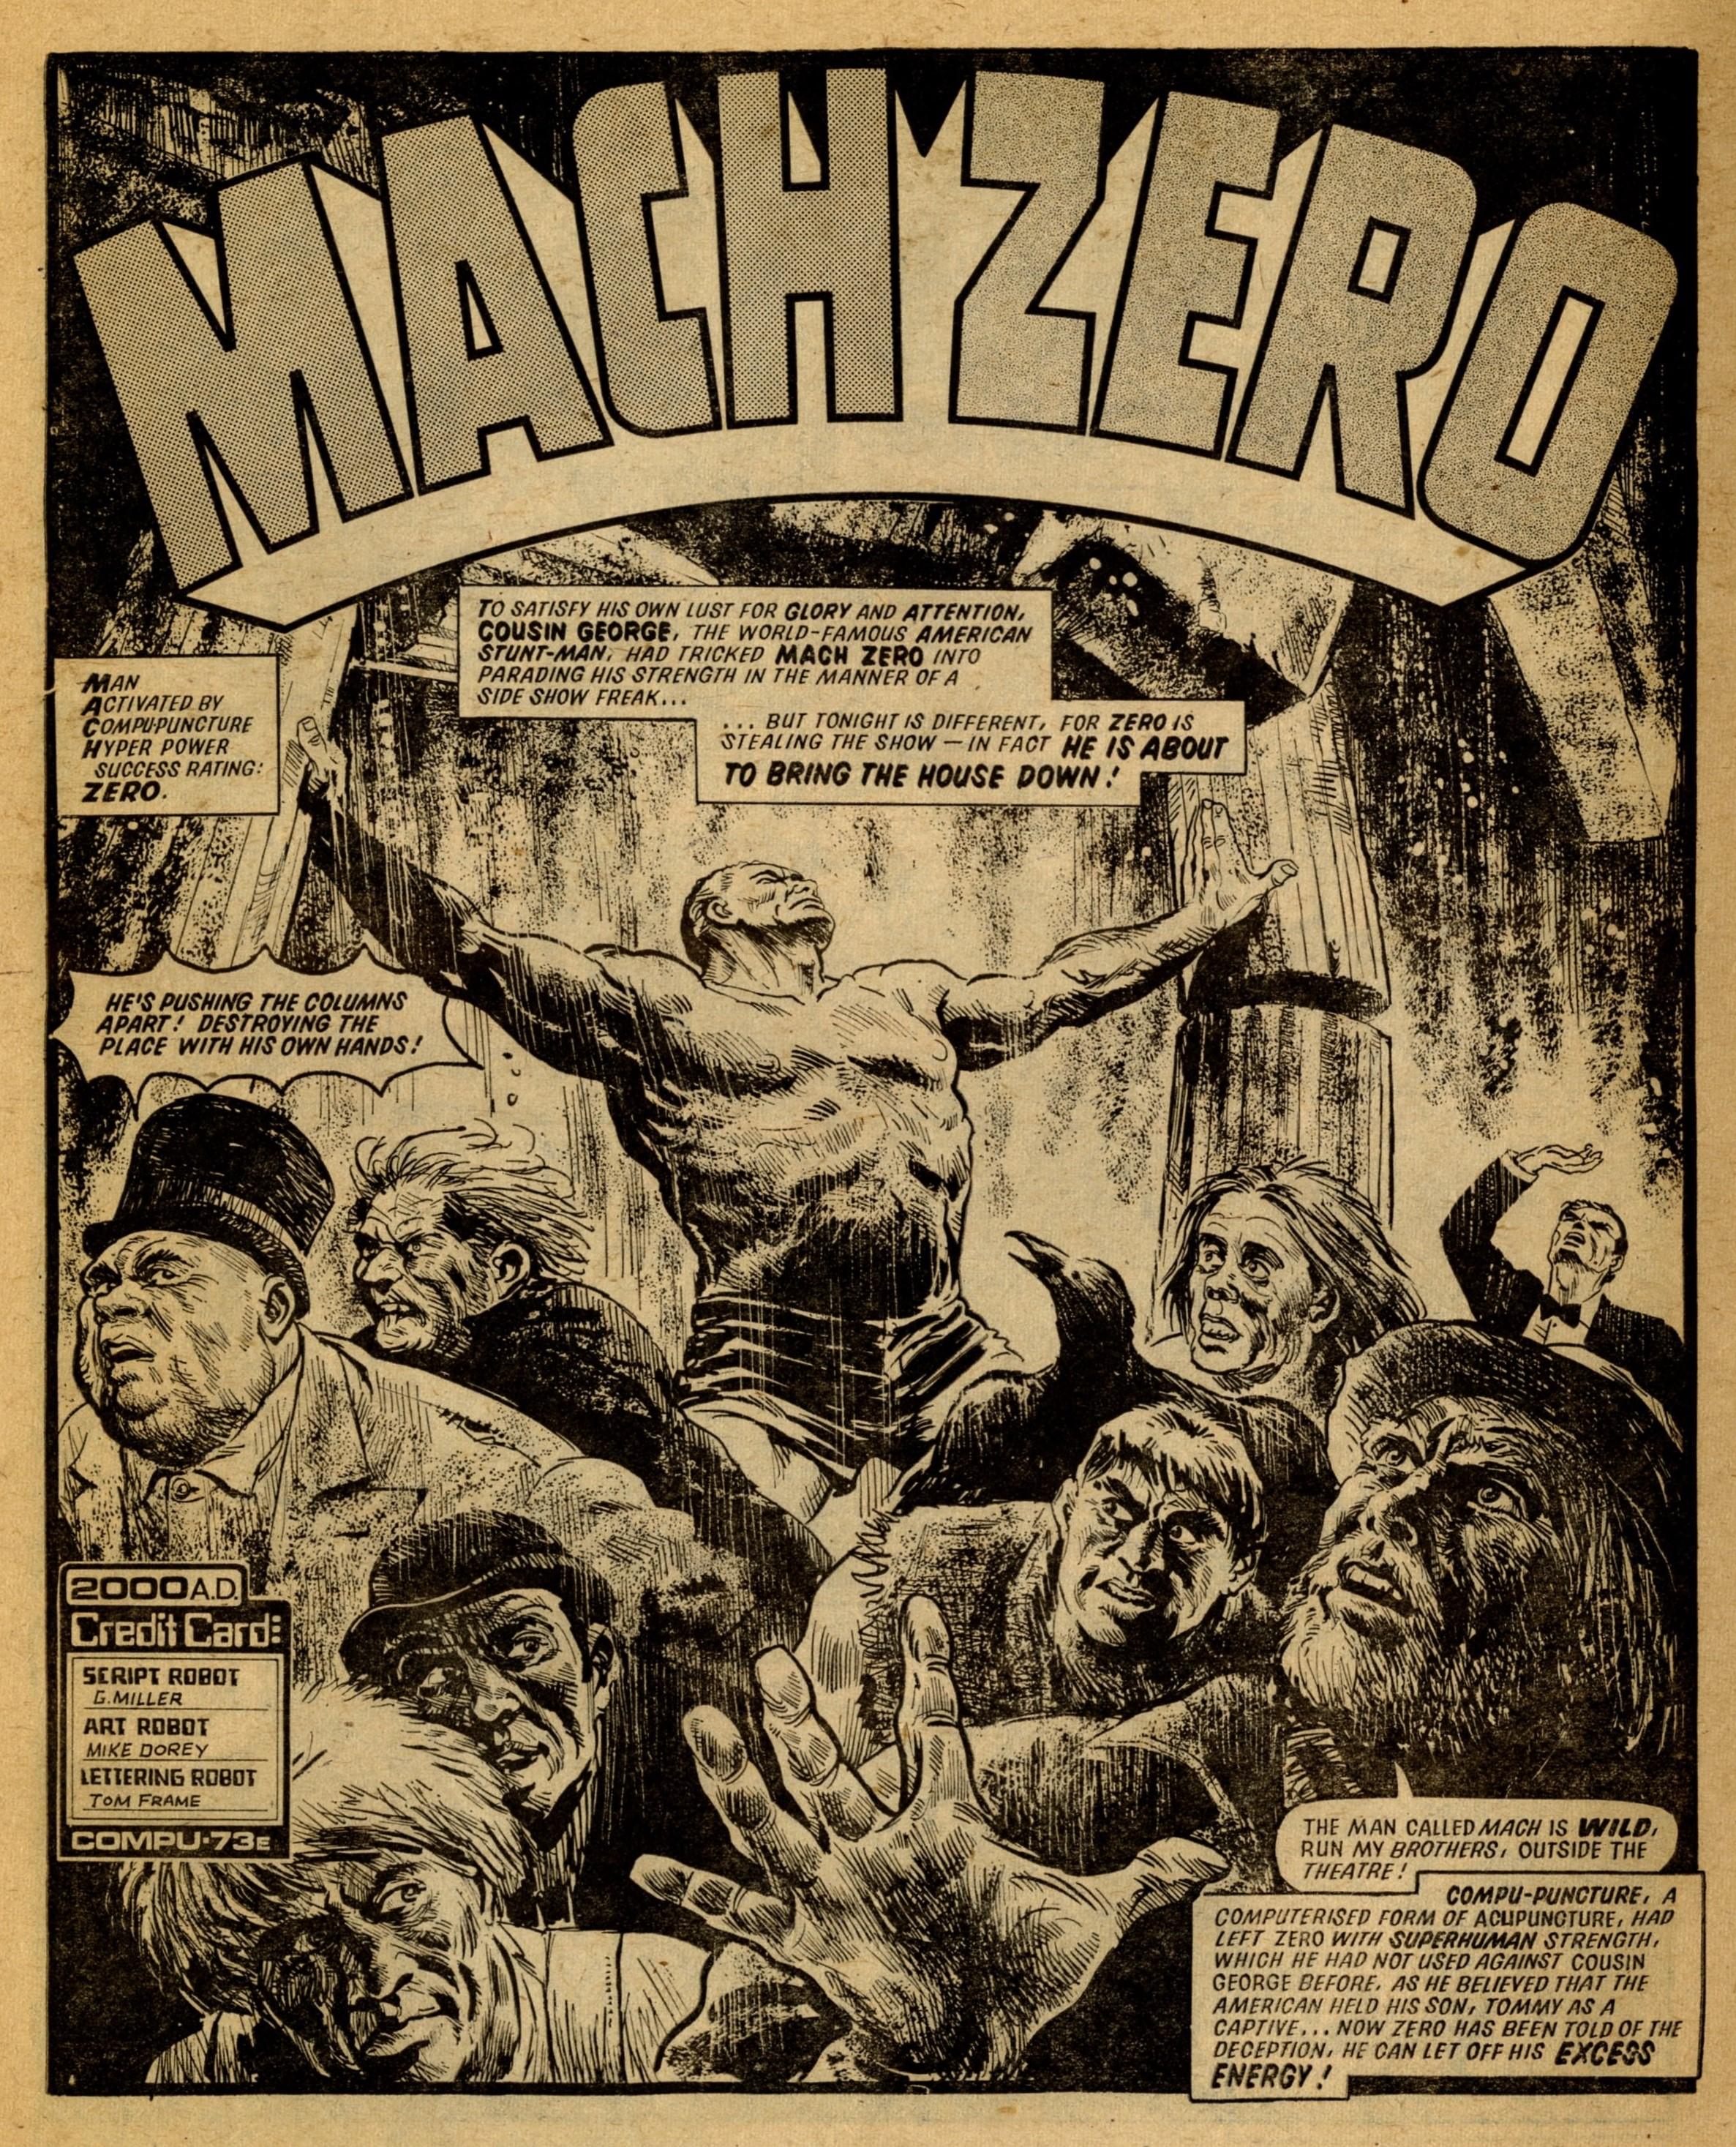 MACH Zero: Steve MacManus (writer), Mike Dorey (artist)